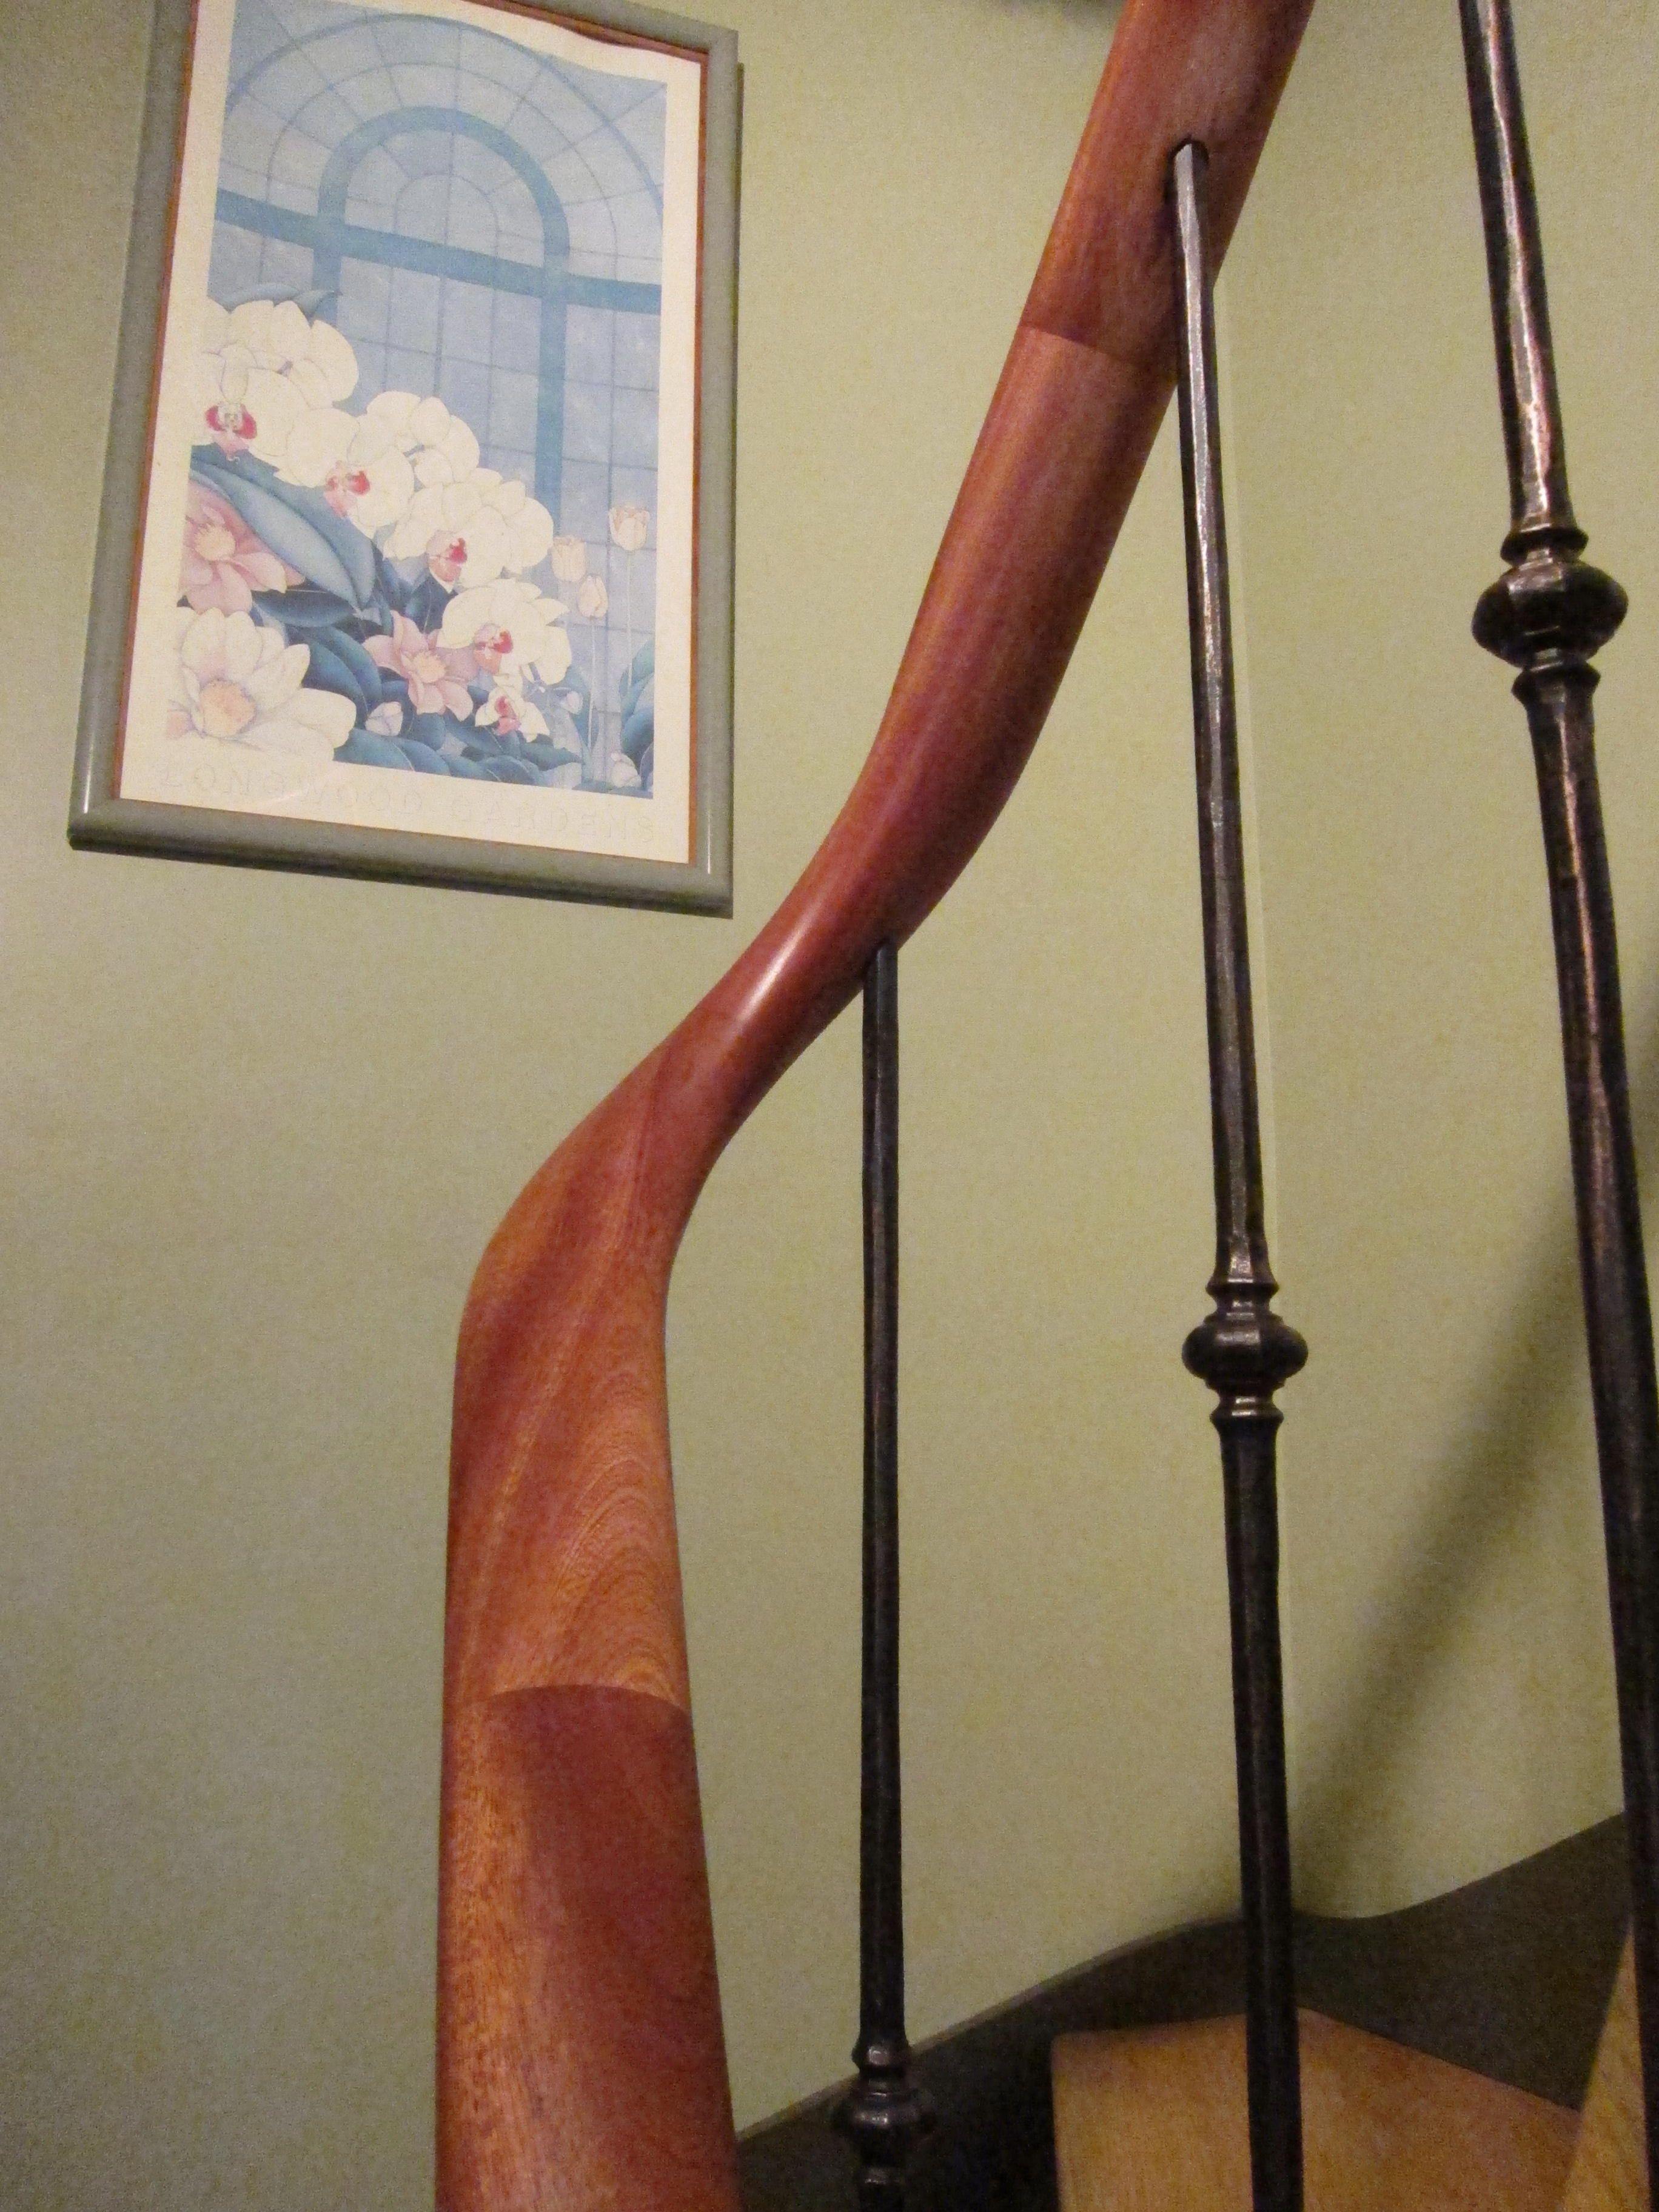 Wreath Handrail, Custom Handrail, Wood Handrail, Handrail